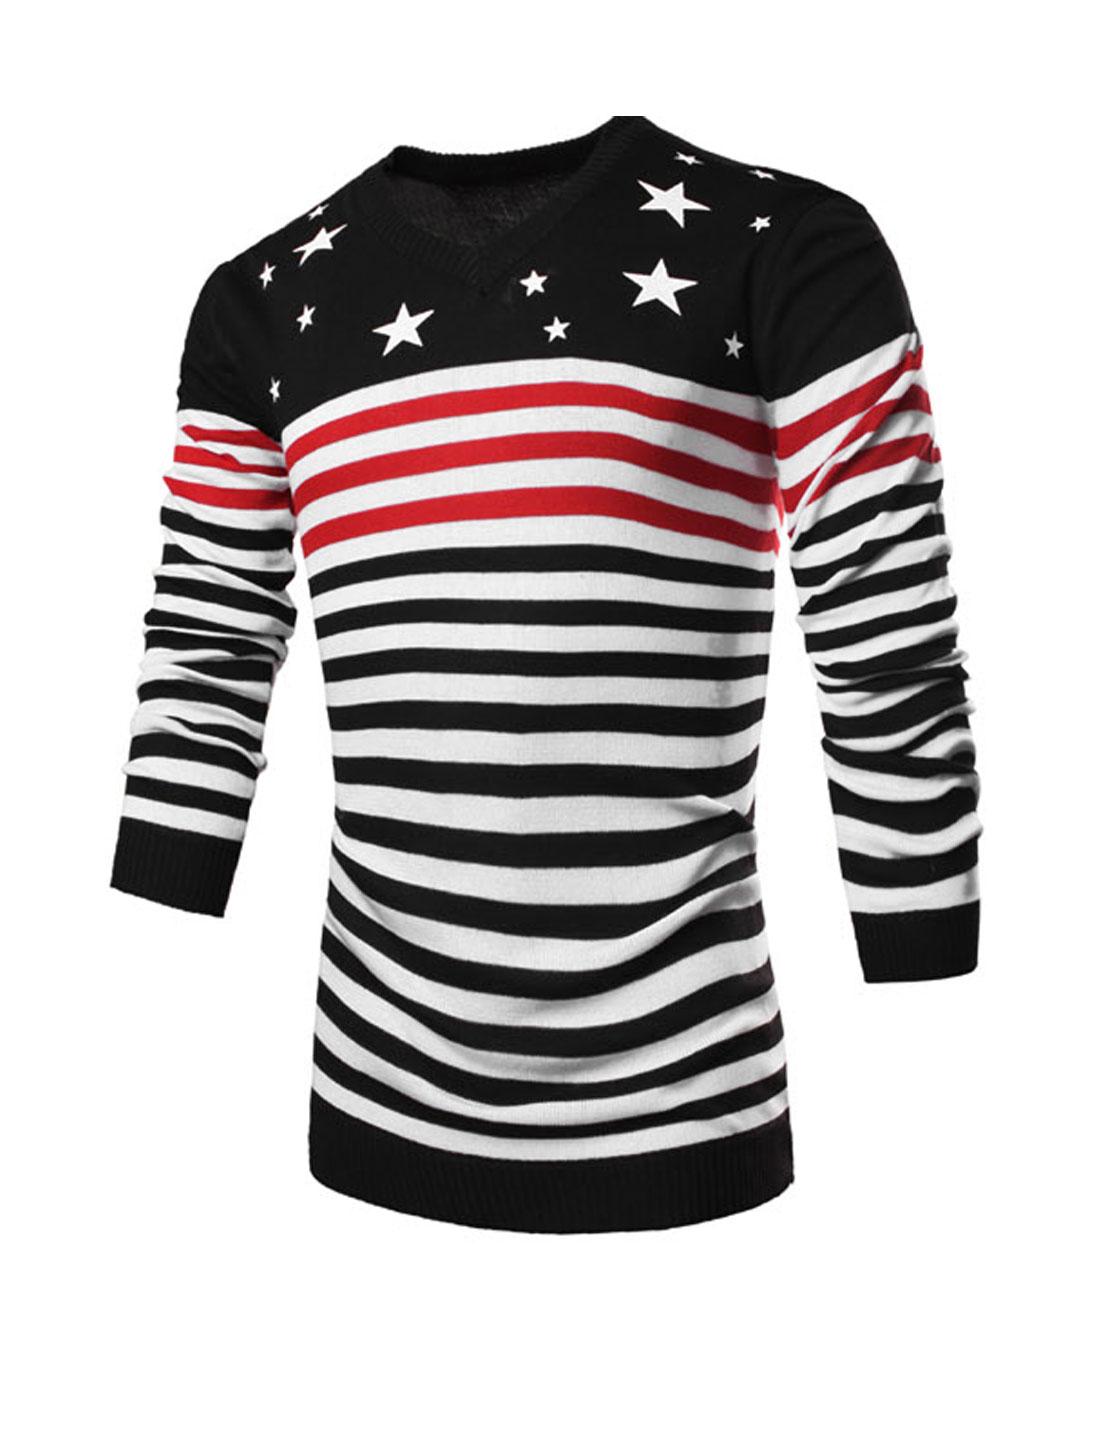 Men V Neck Long Sleeve Stripes Stars Print Pullover Knit Shirt Black Red M